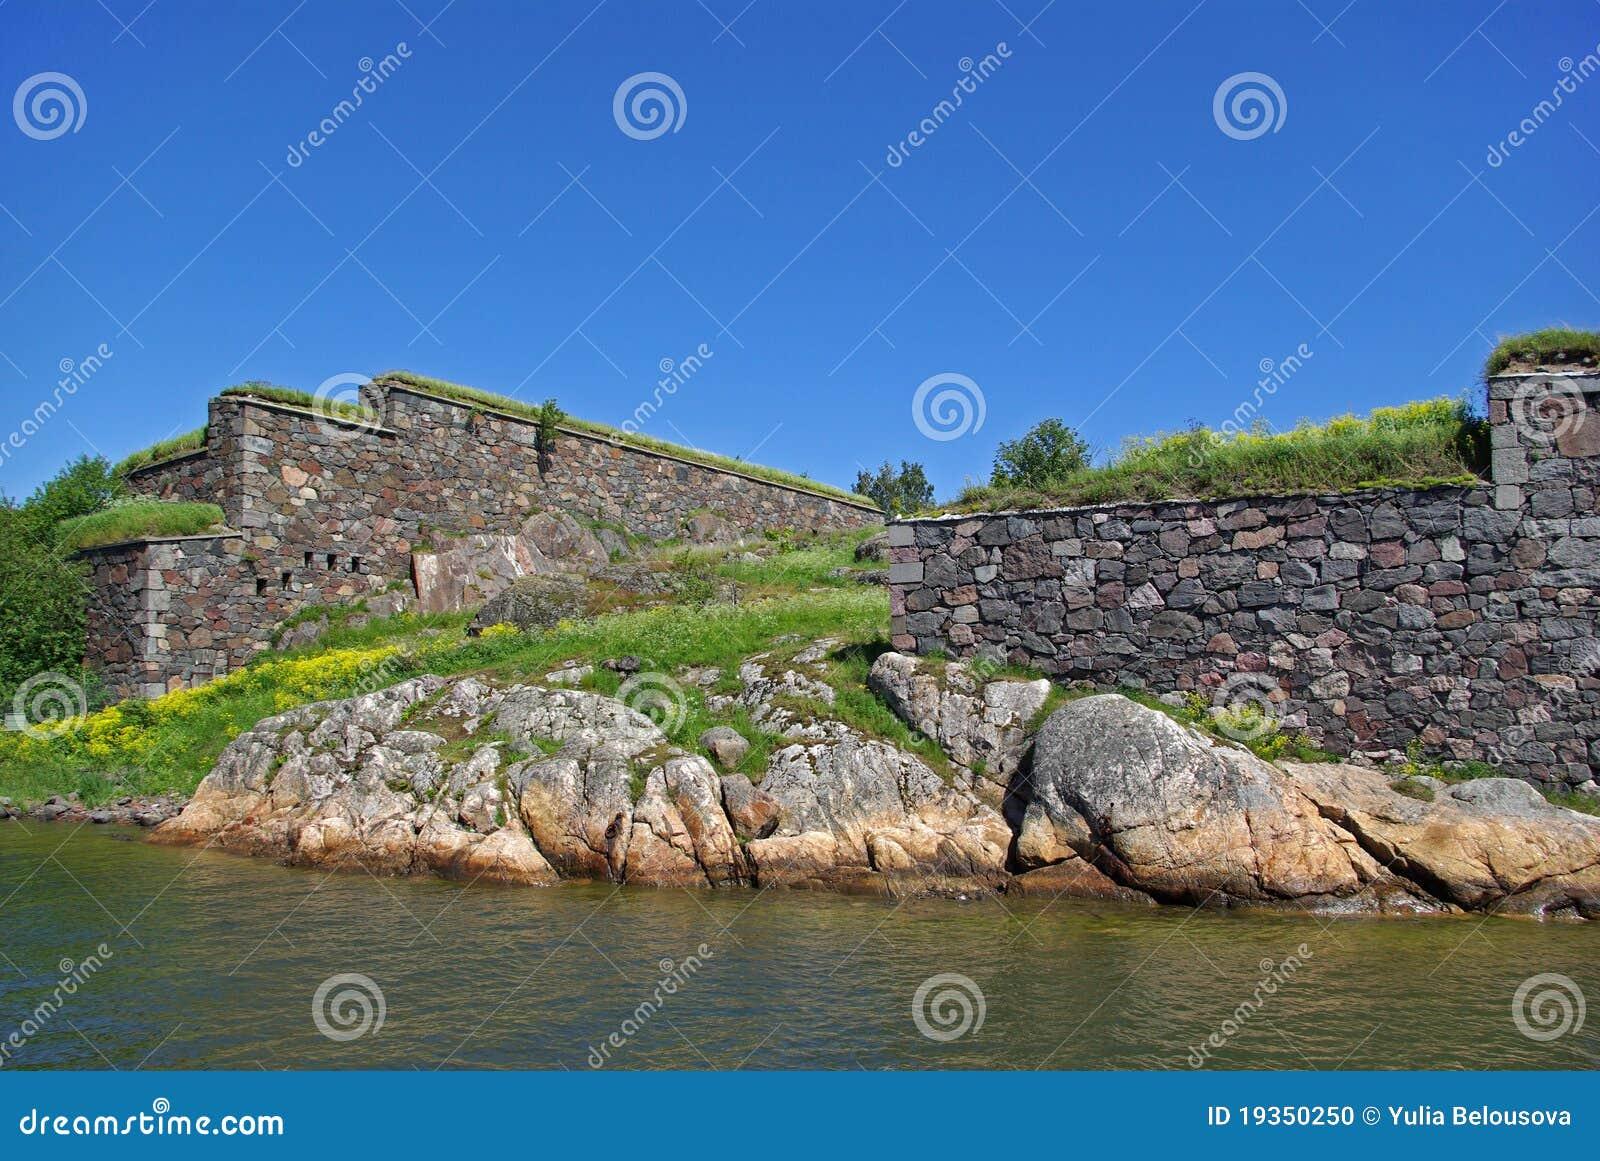 Suomenlinna - fortaleza do mar de sweden